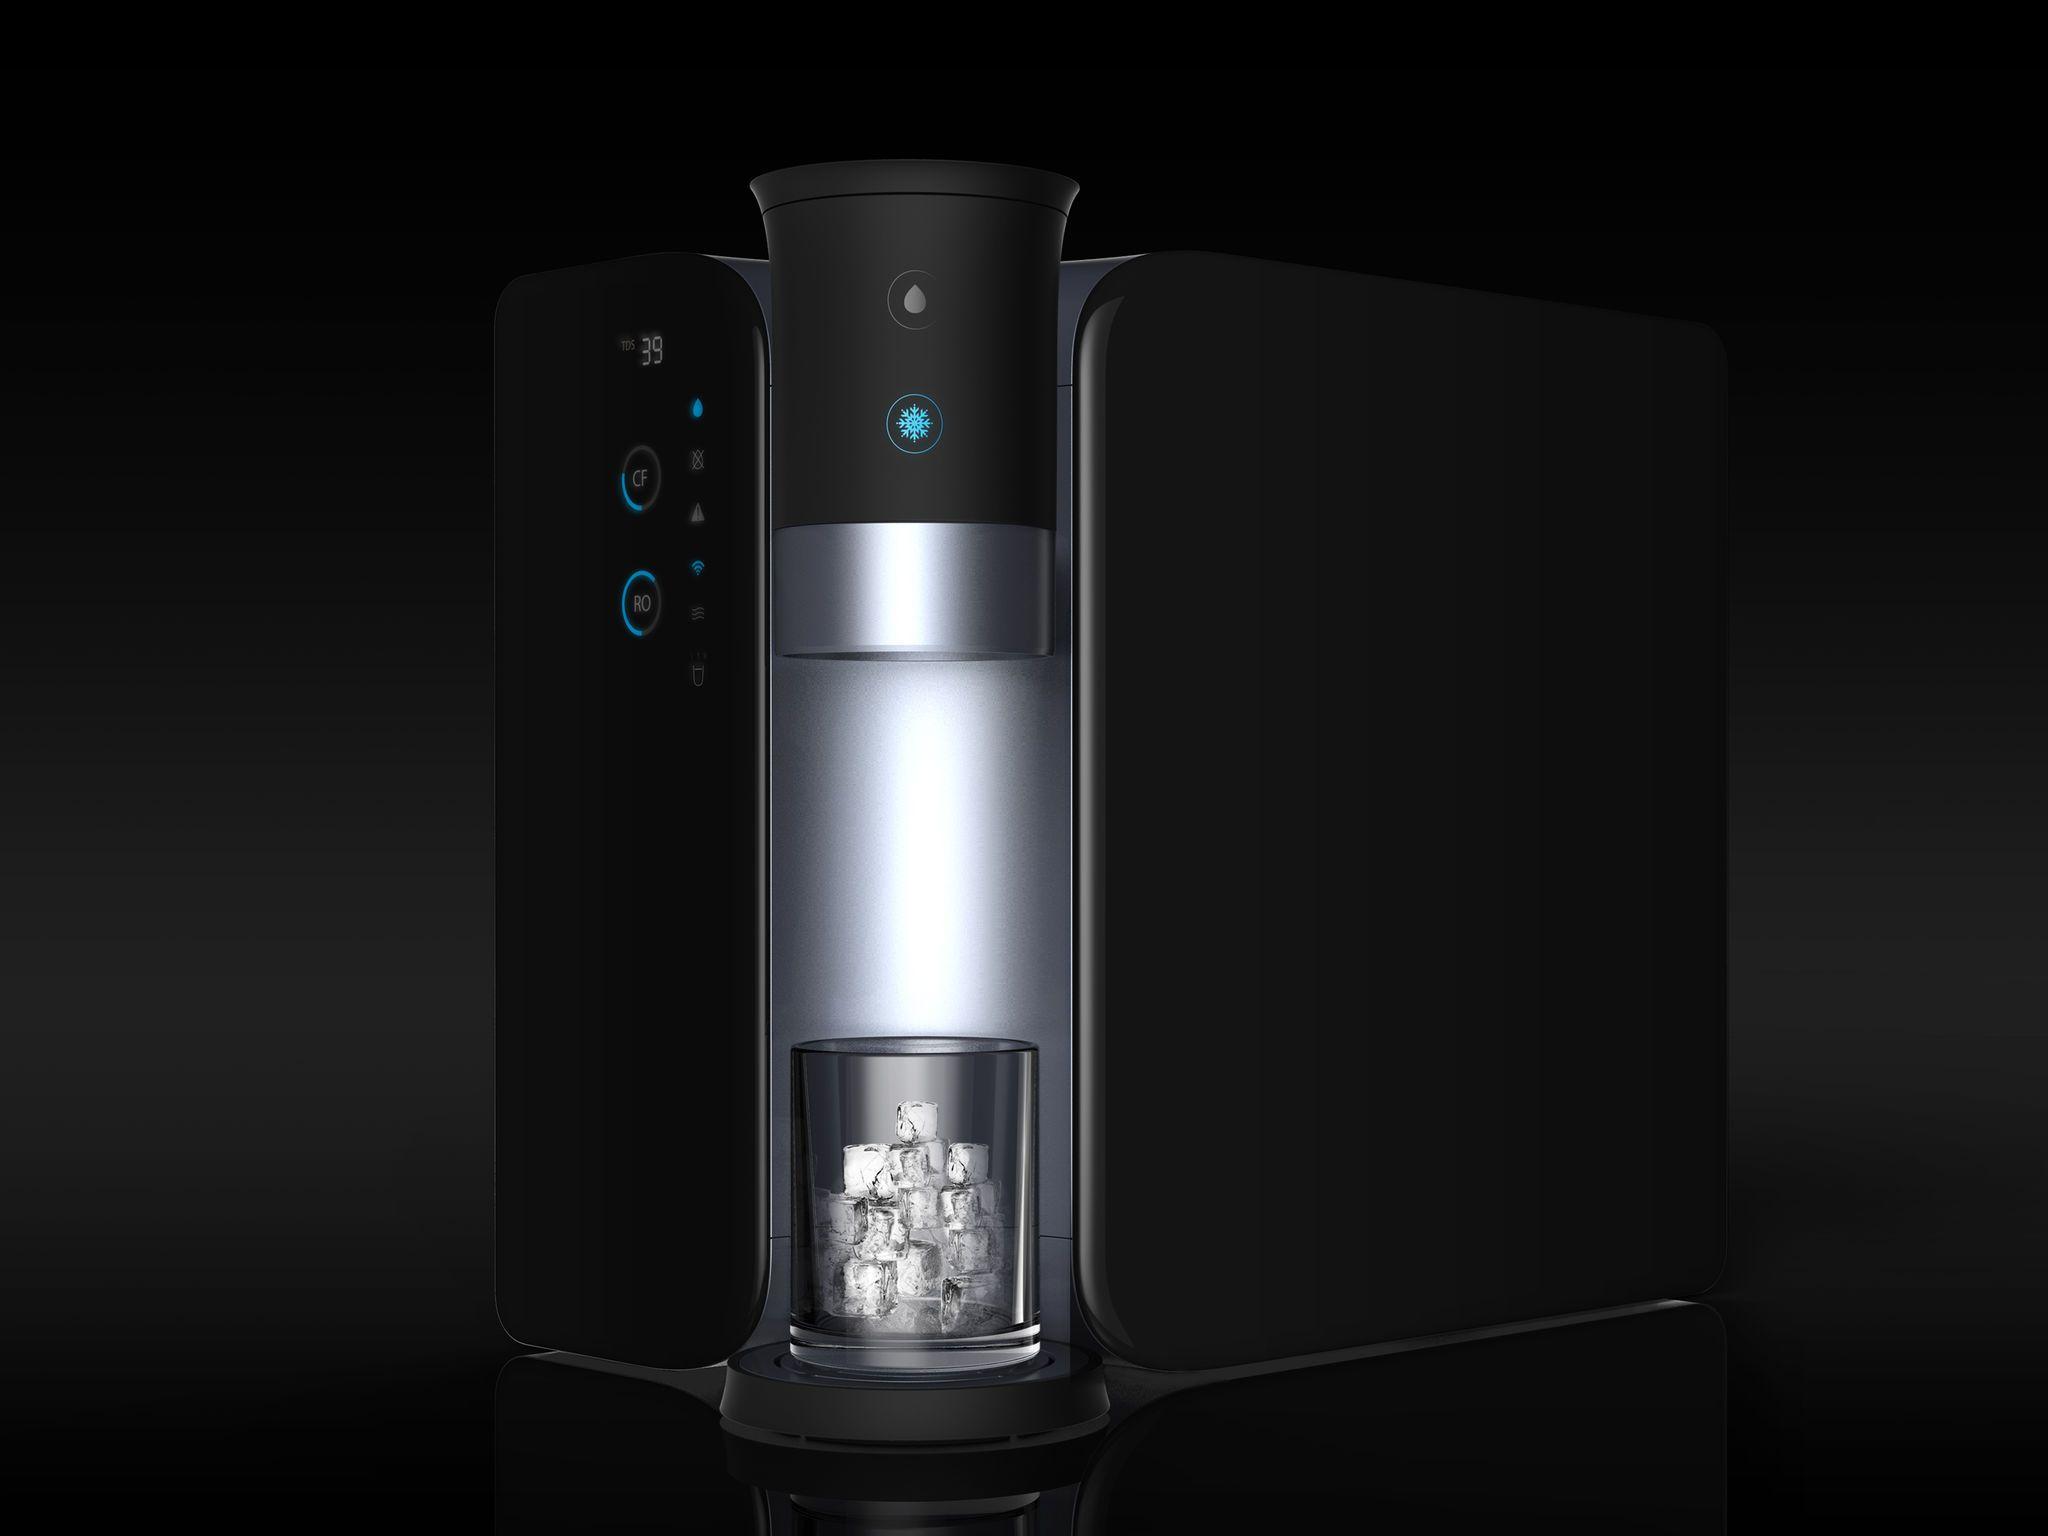 Intelligent Ice Maker Water dispenser, Ice maker, Faucet